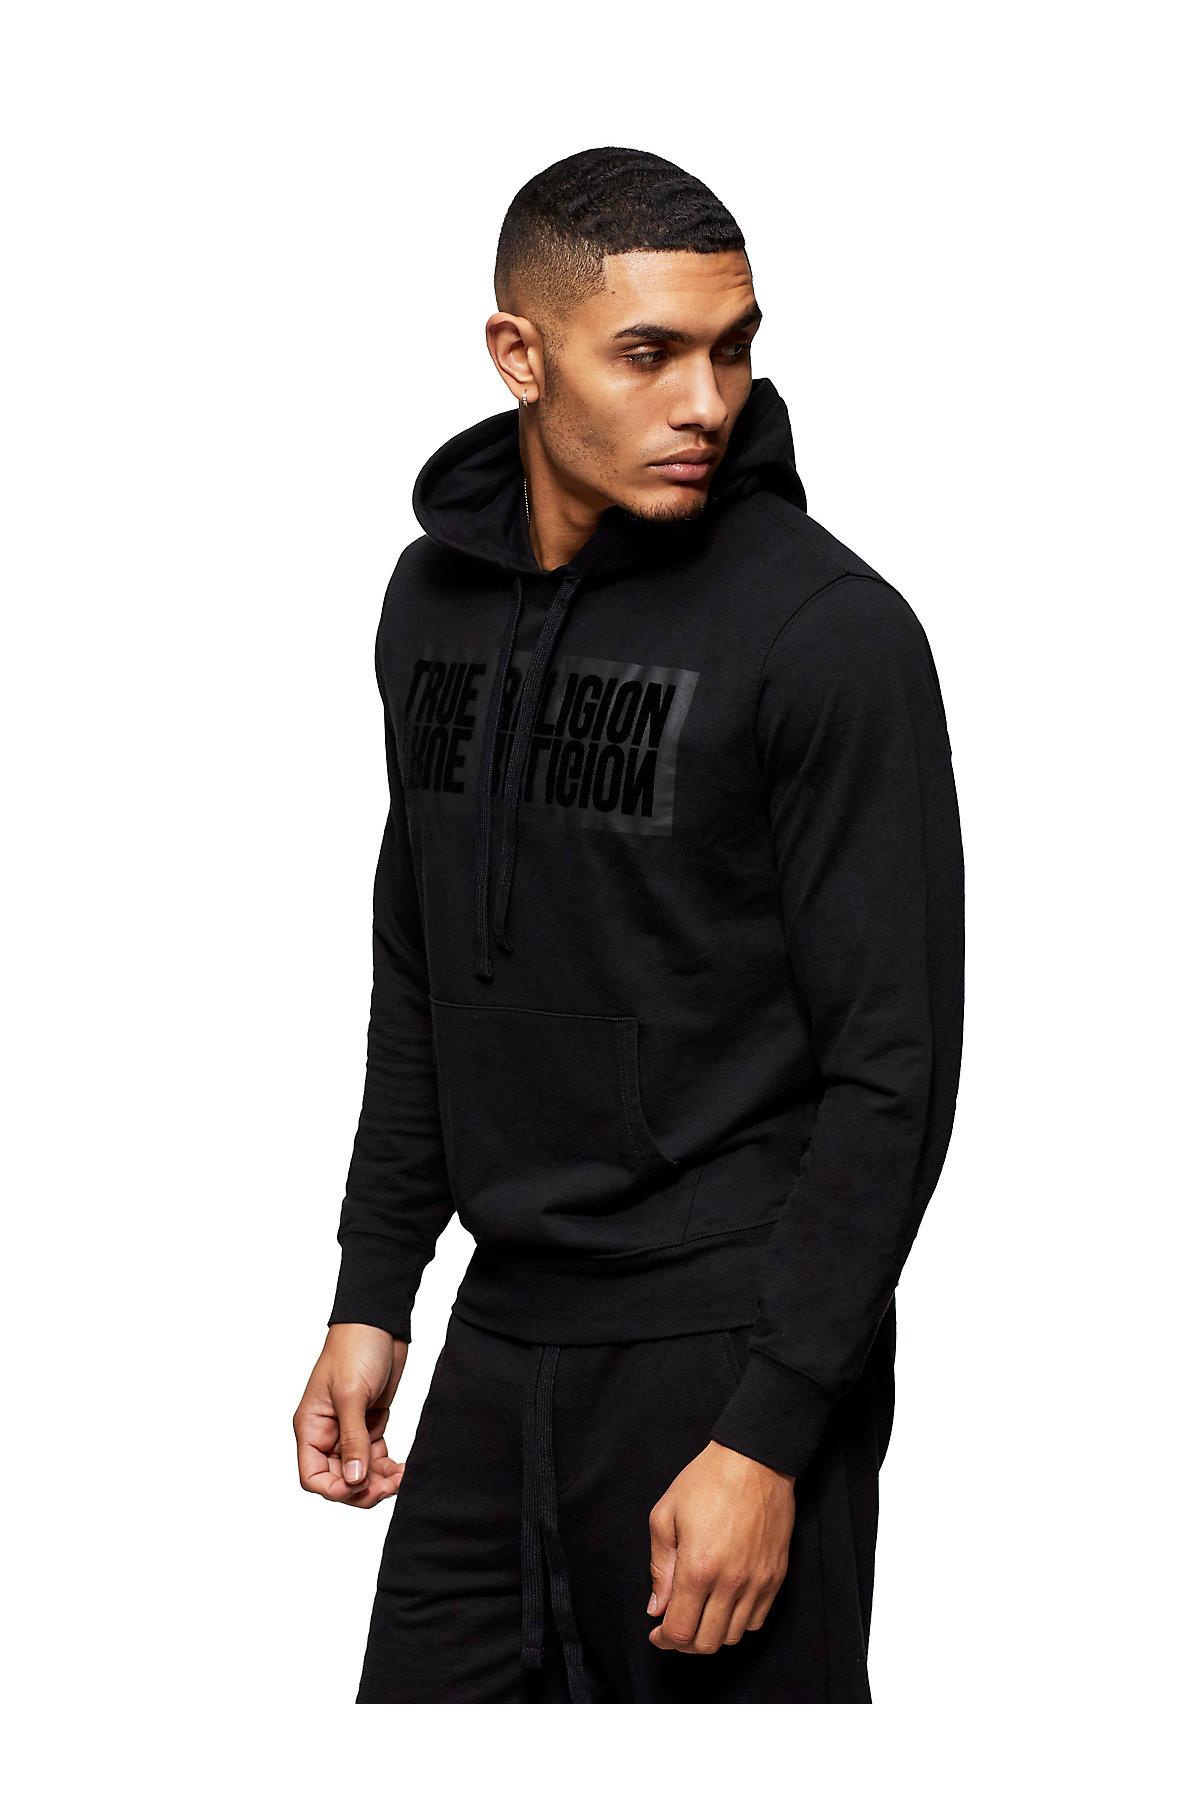 True-Religion-Men-039-s-Mirror-Logo-Reflection-Pullover-Hoodie-Sweatshirt thumbnail 8